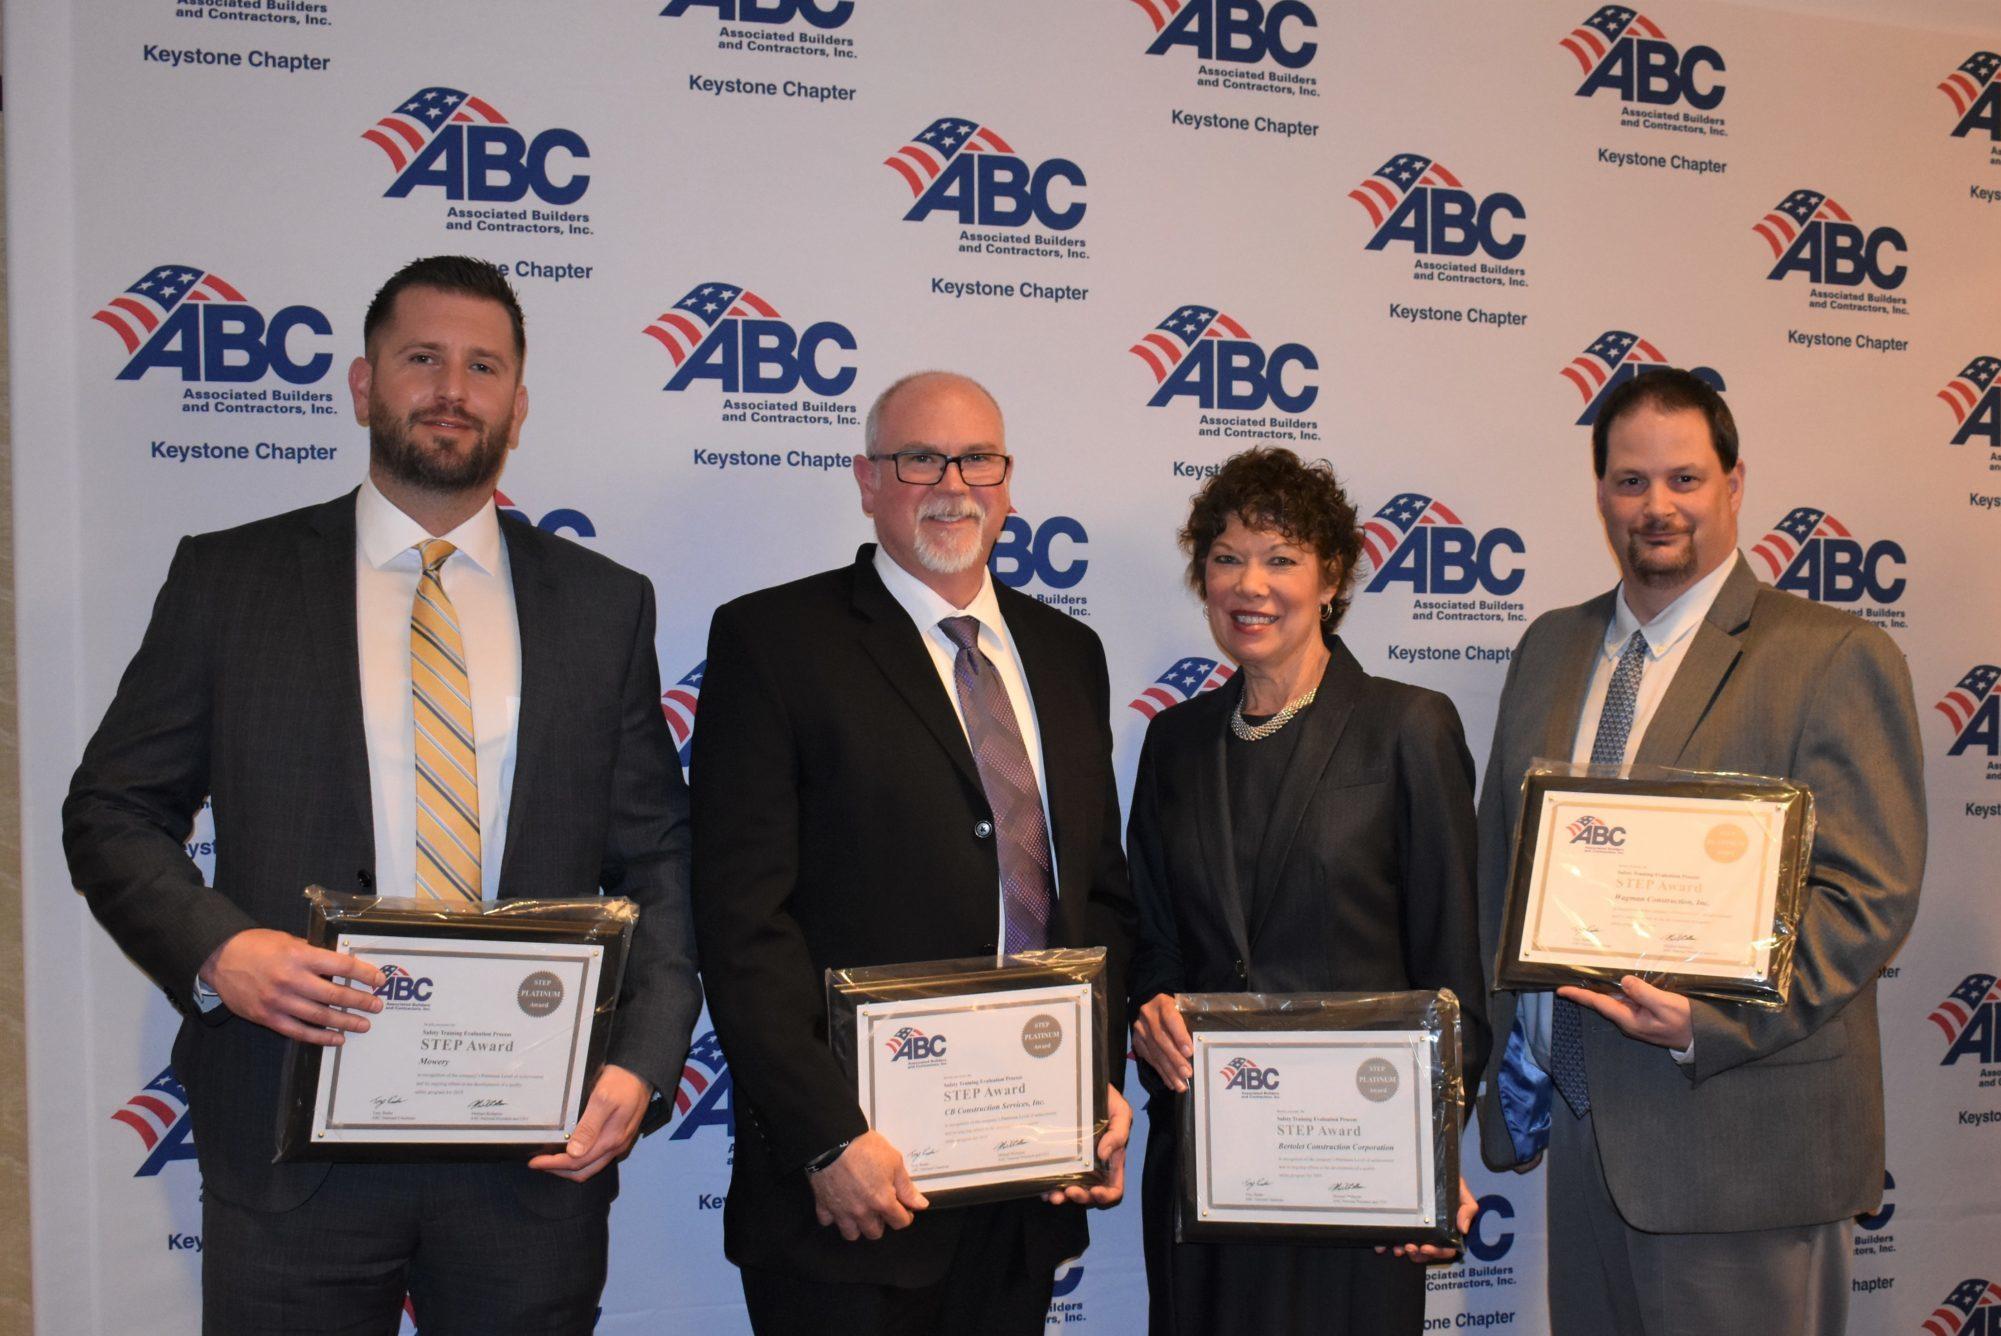 ABC Keystone 2019 Safety Awards